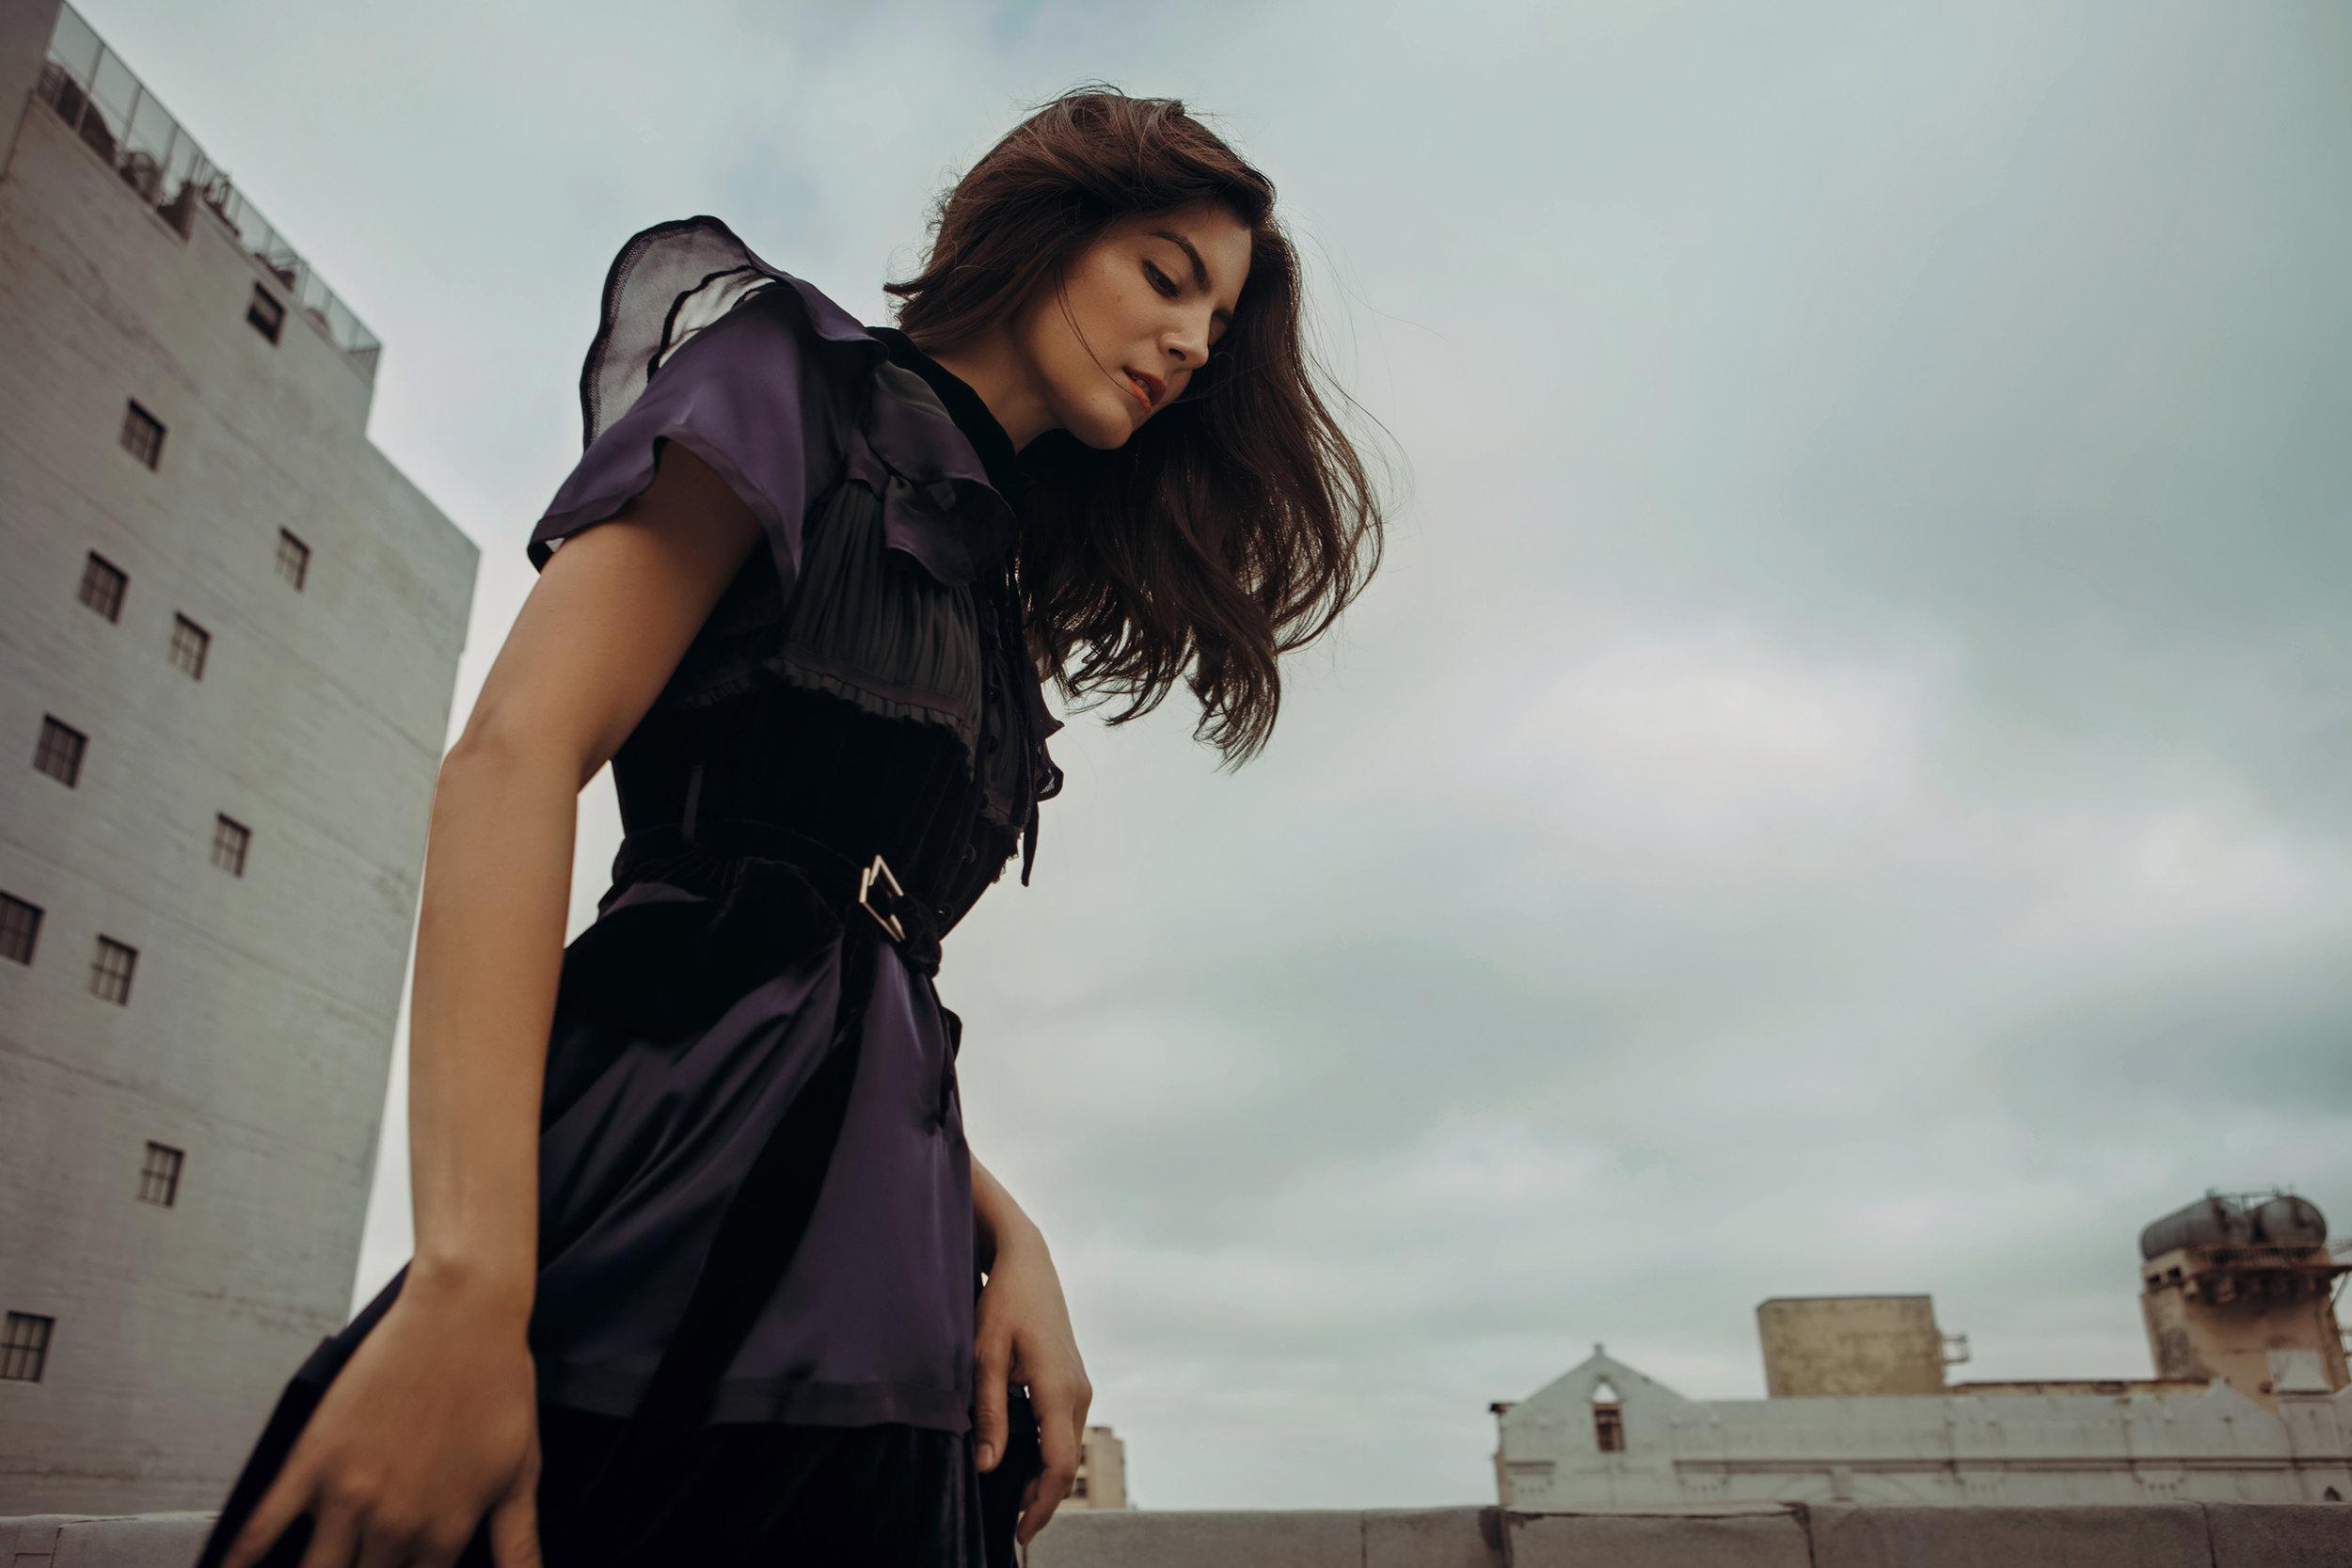 Dress by   SACAI   |   Barneys New York, Beverly Hills  ; Earrings by   JENNY BIRD